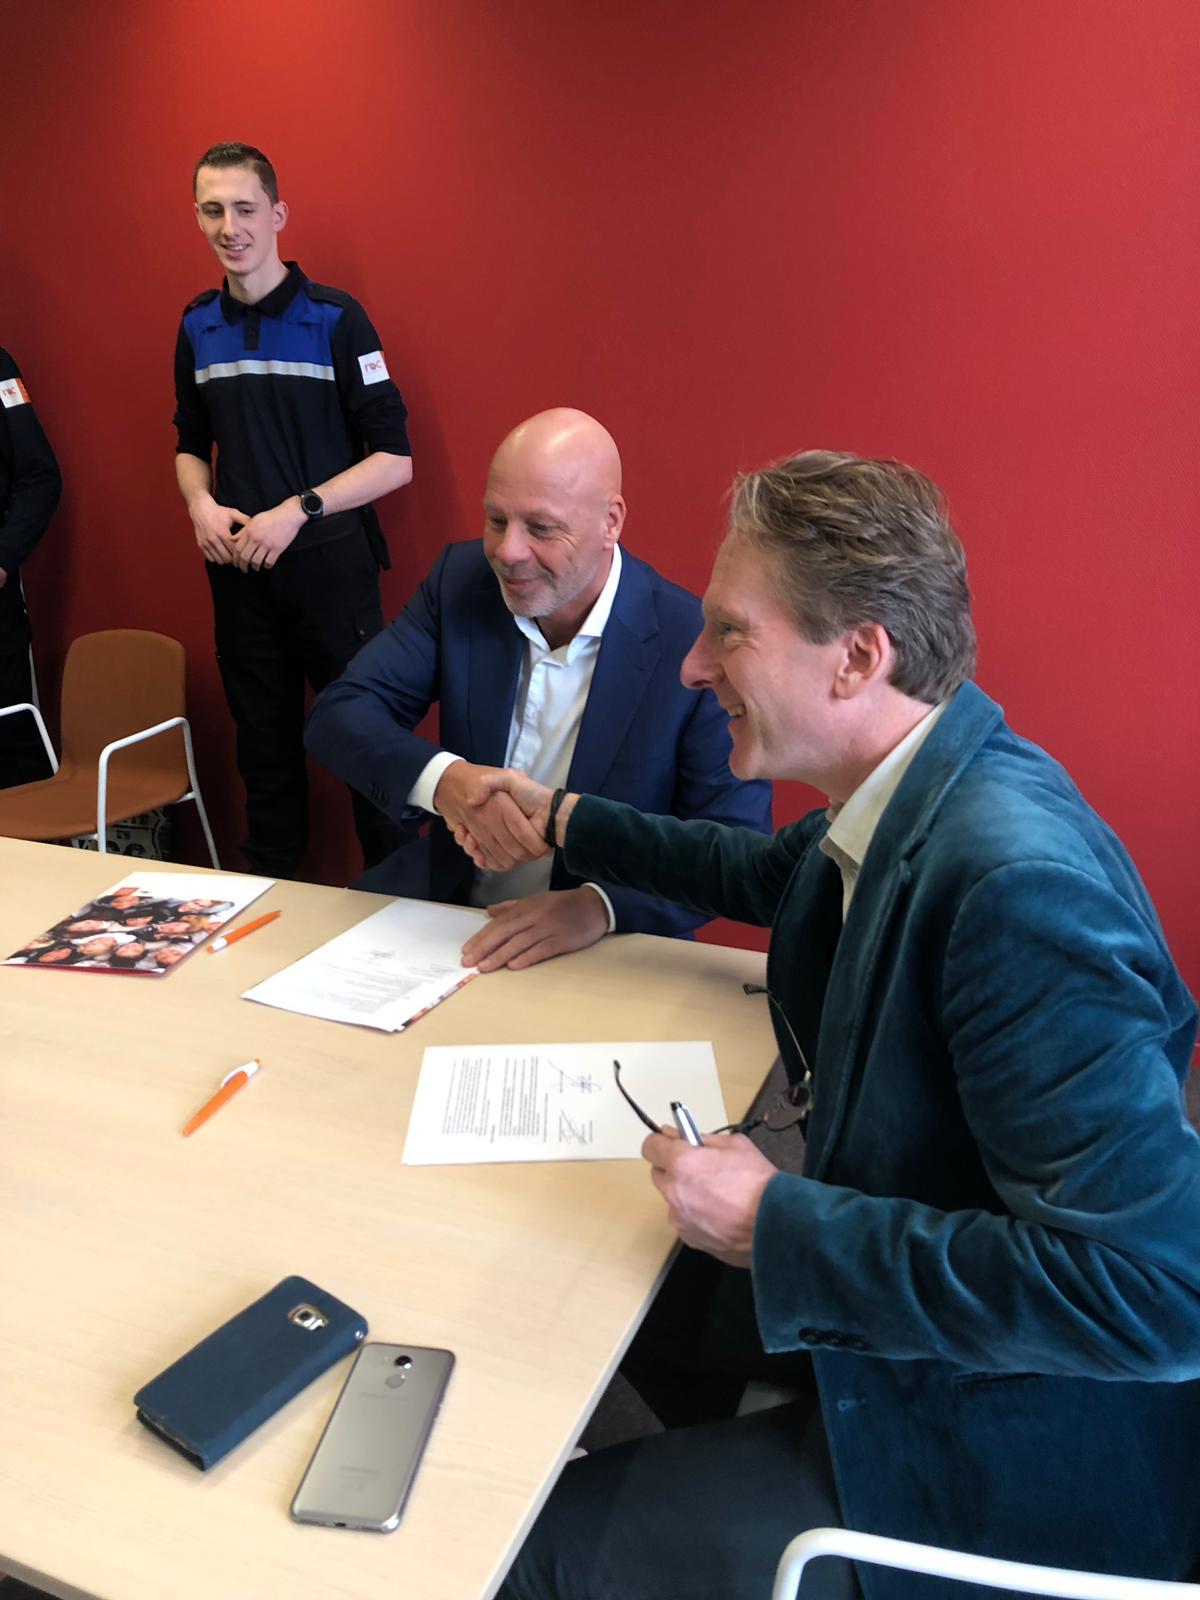 Keolis Nederland en MBO College Almere starten samenwerking